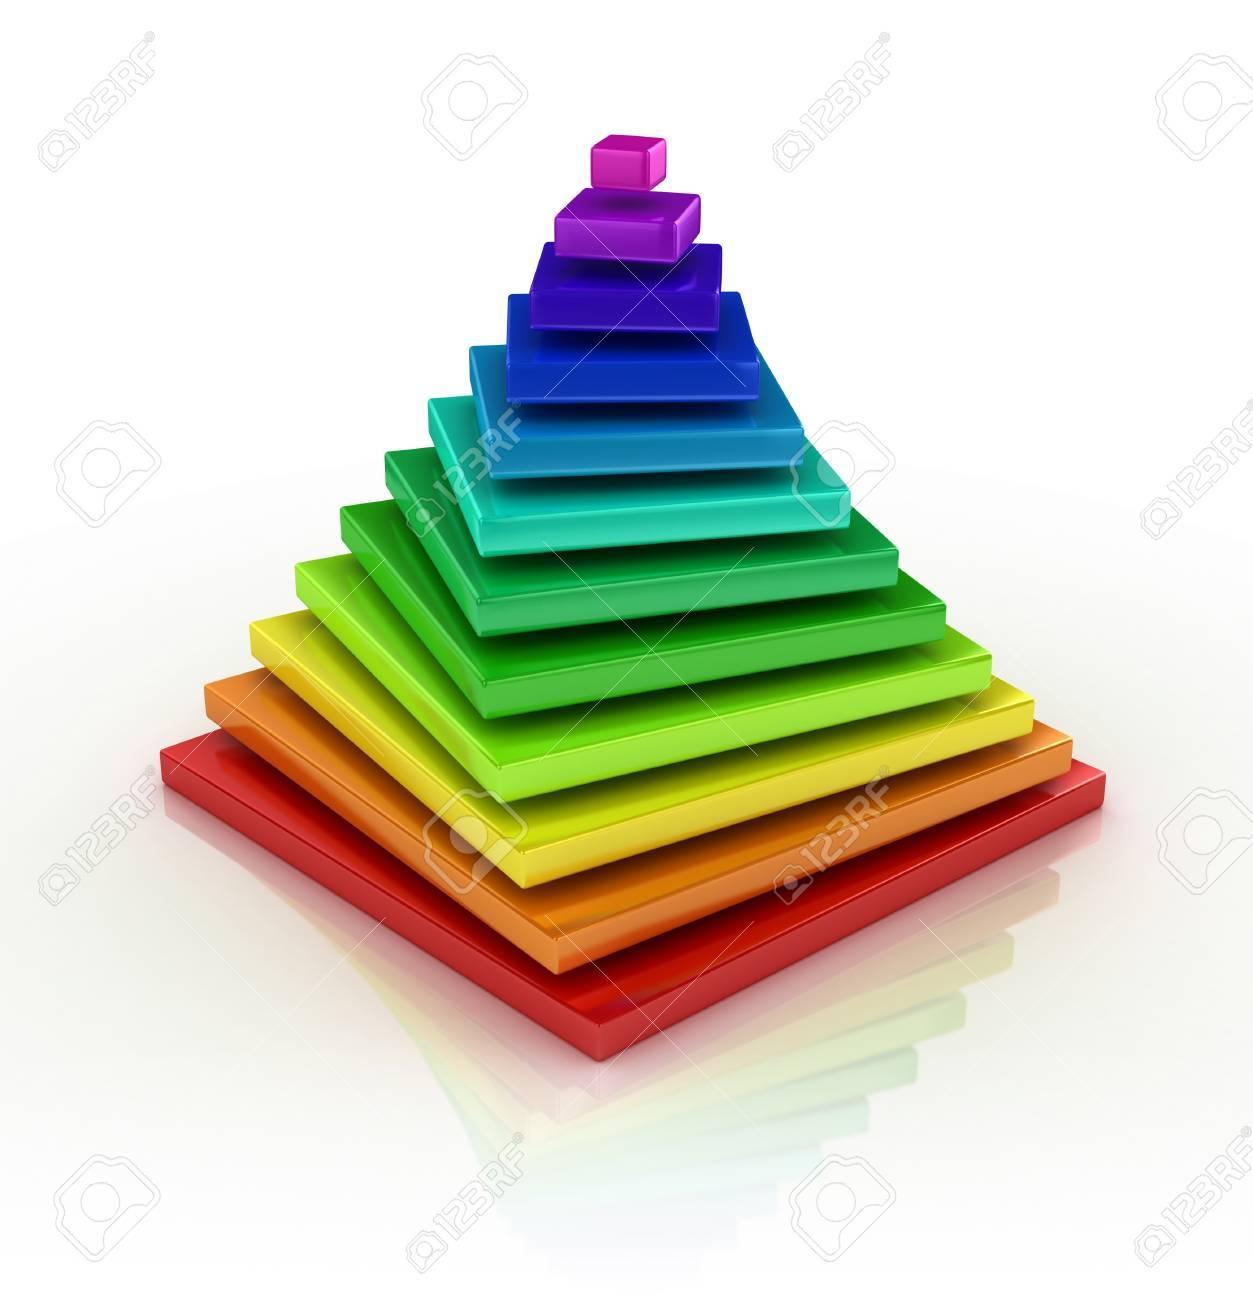 abstract colorful pyramid Stock Photo - 19776252